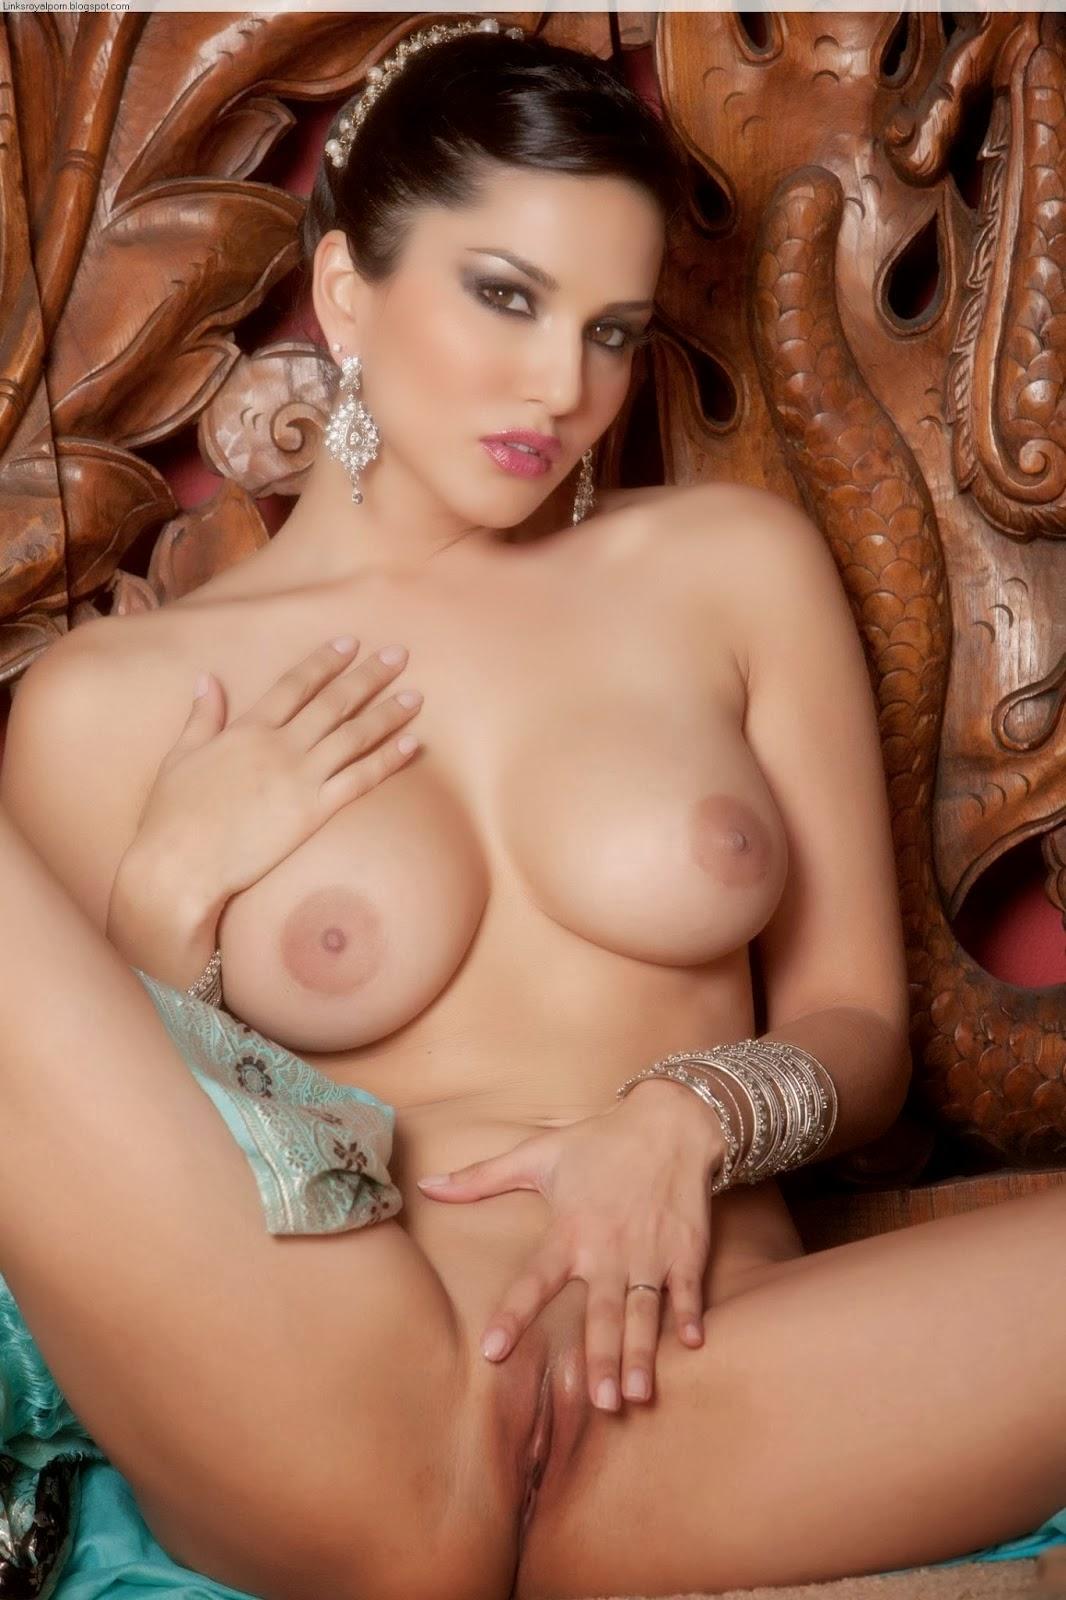 Hot Sex Sunny Leone Nude Hd Photos - Nude Pics-7137